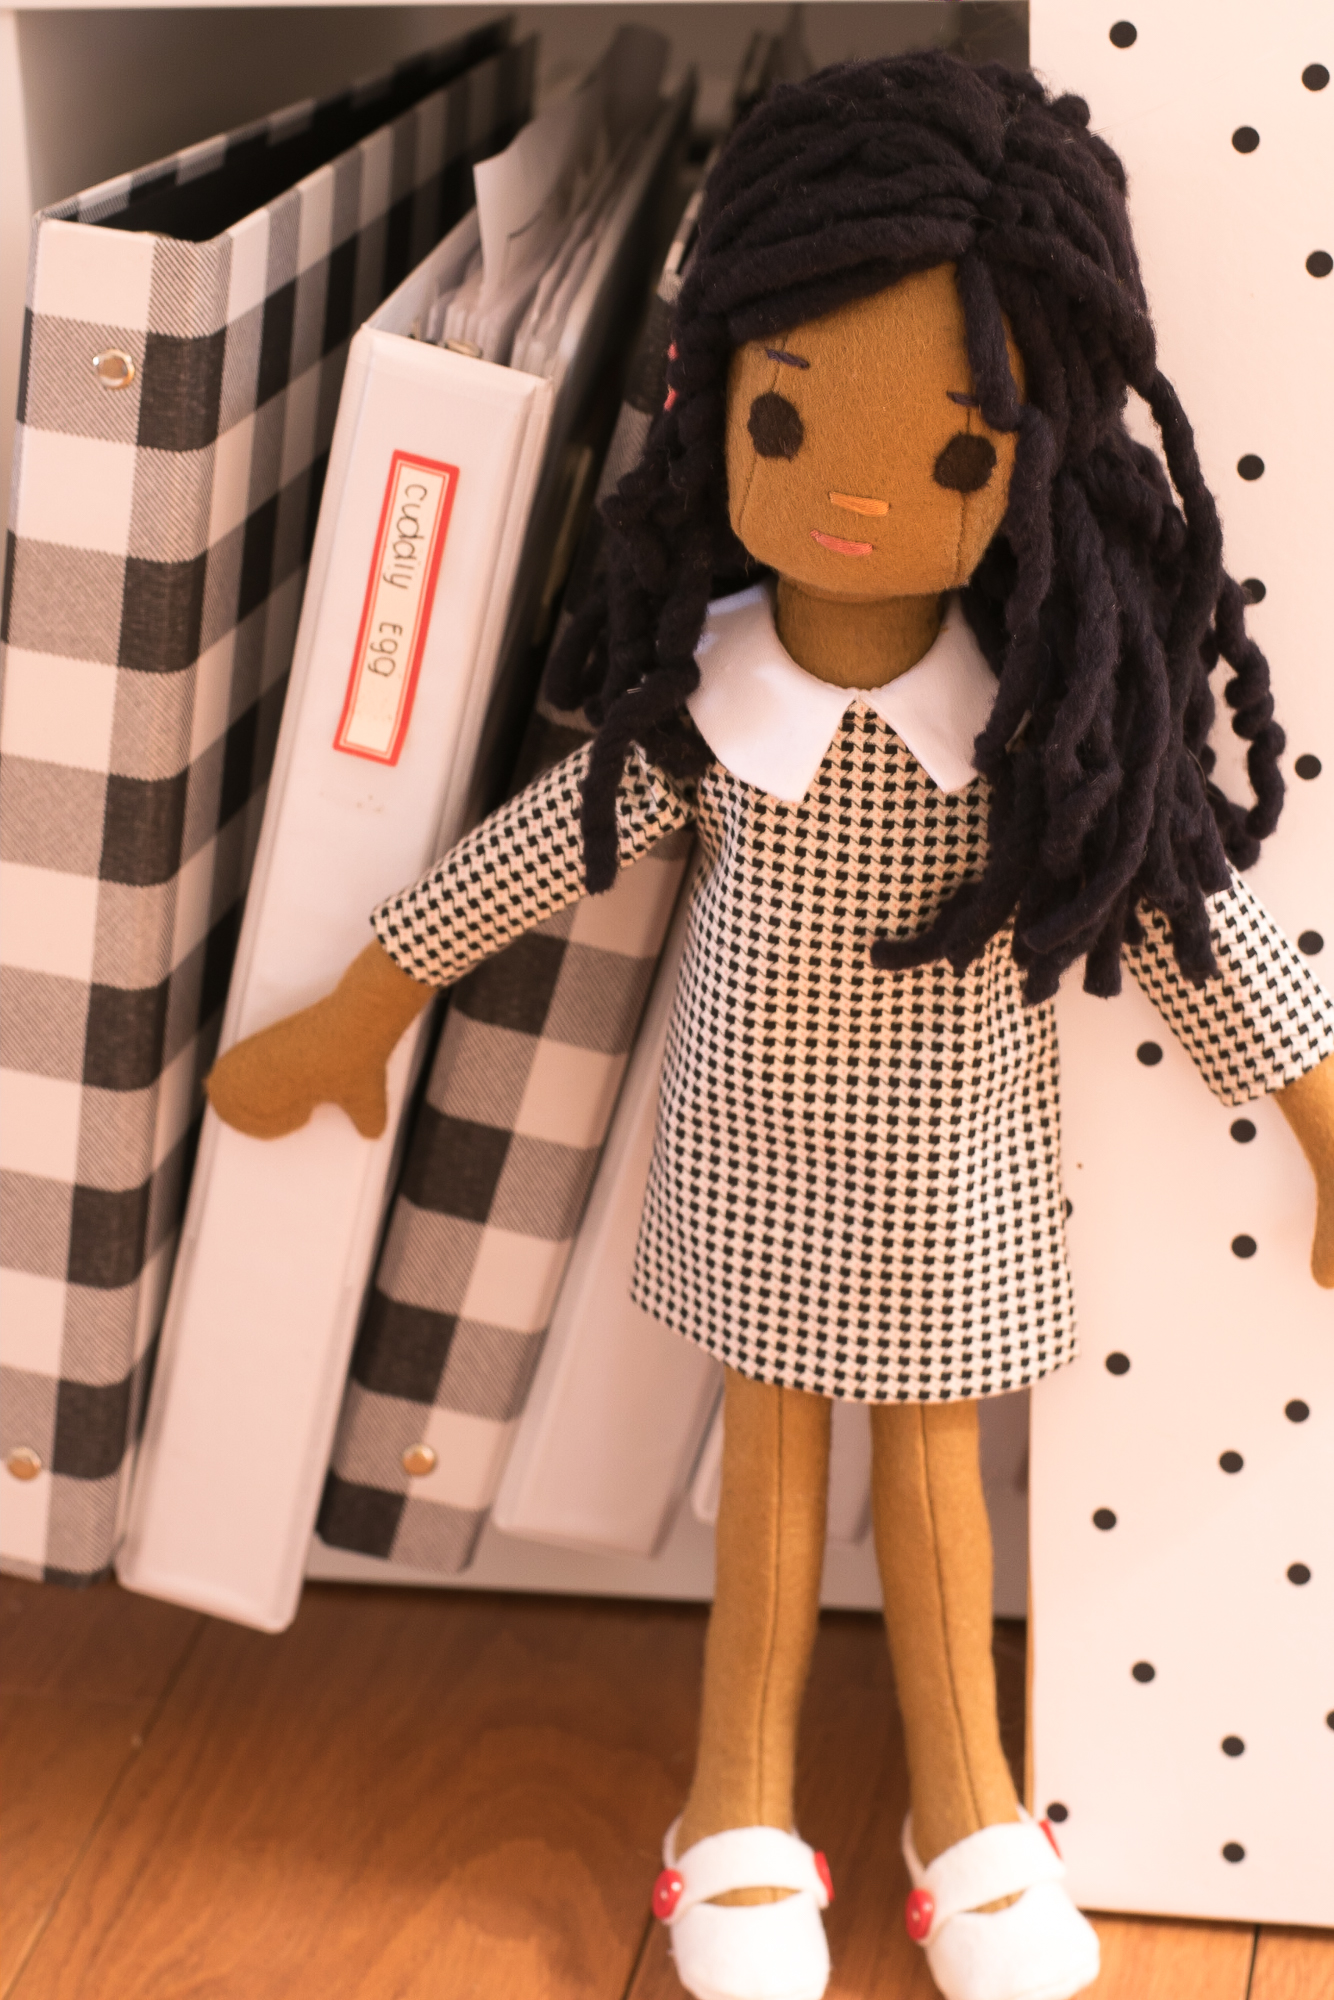 Gallery of Dolls-2.jpg